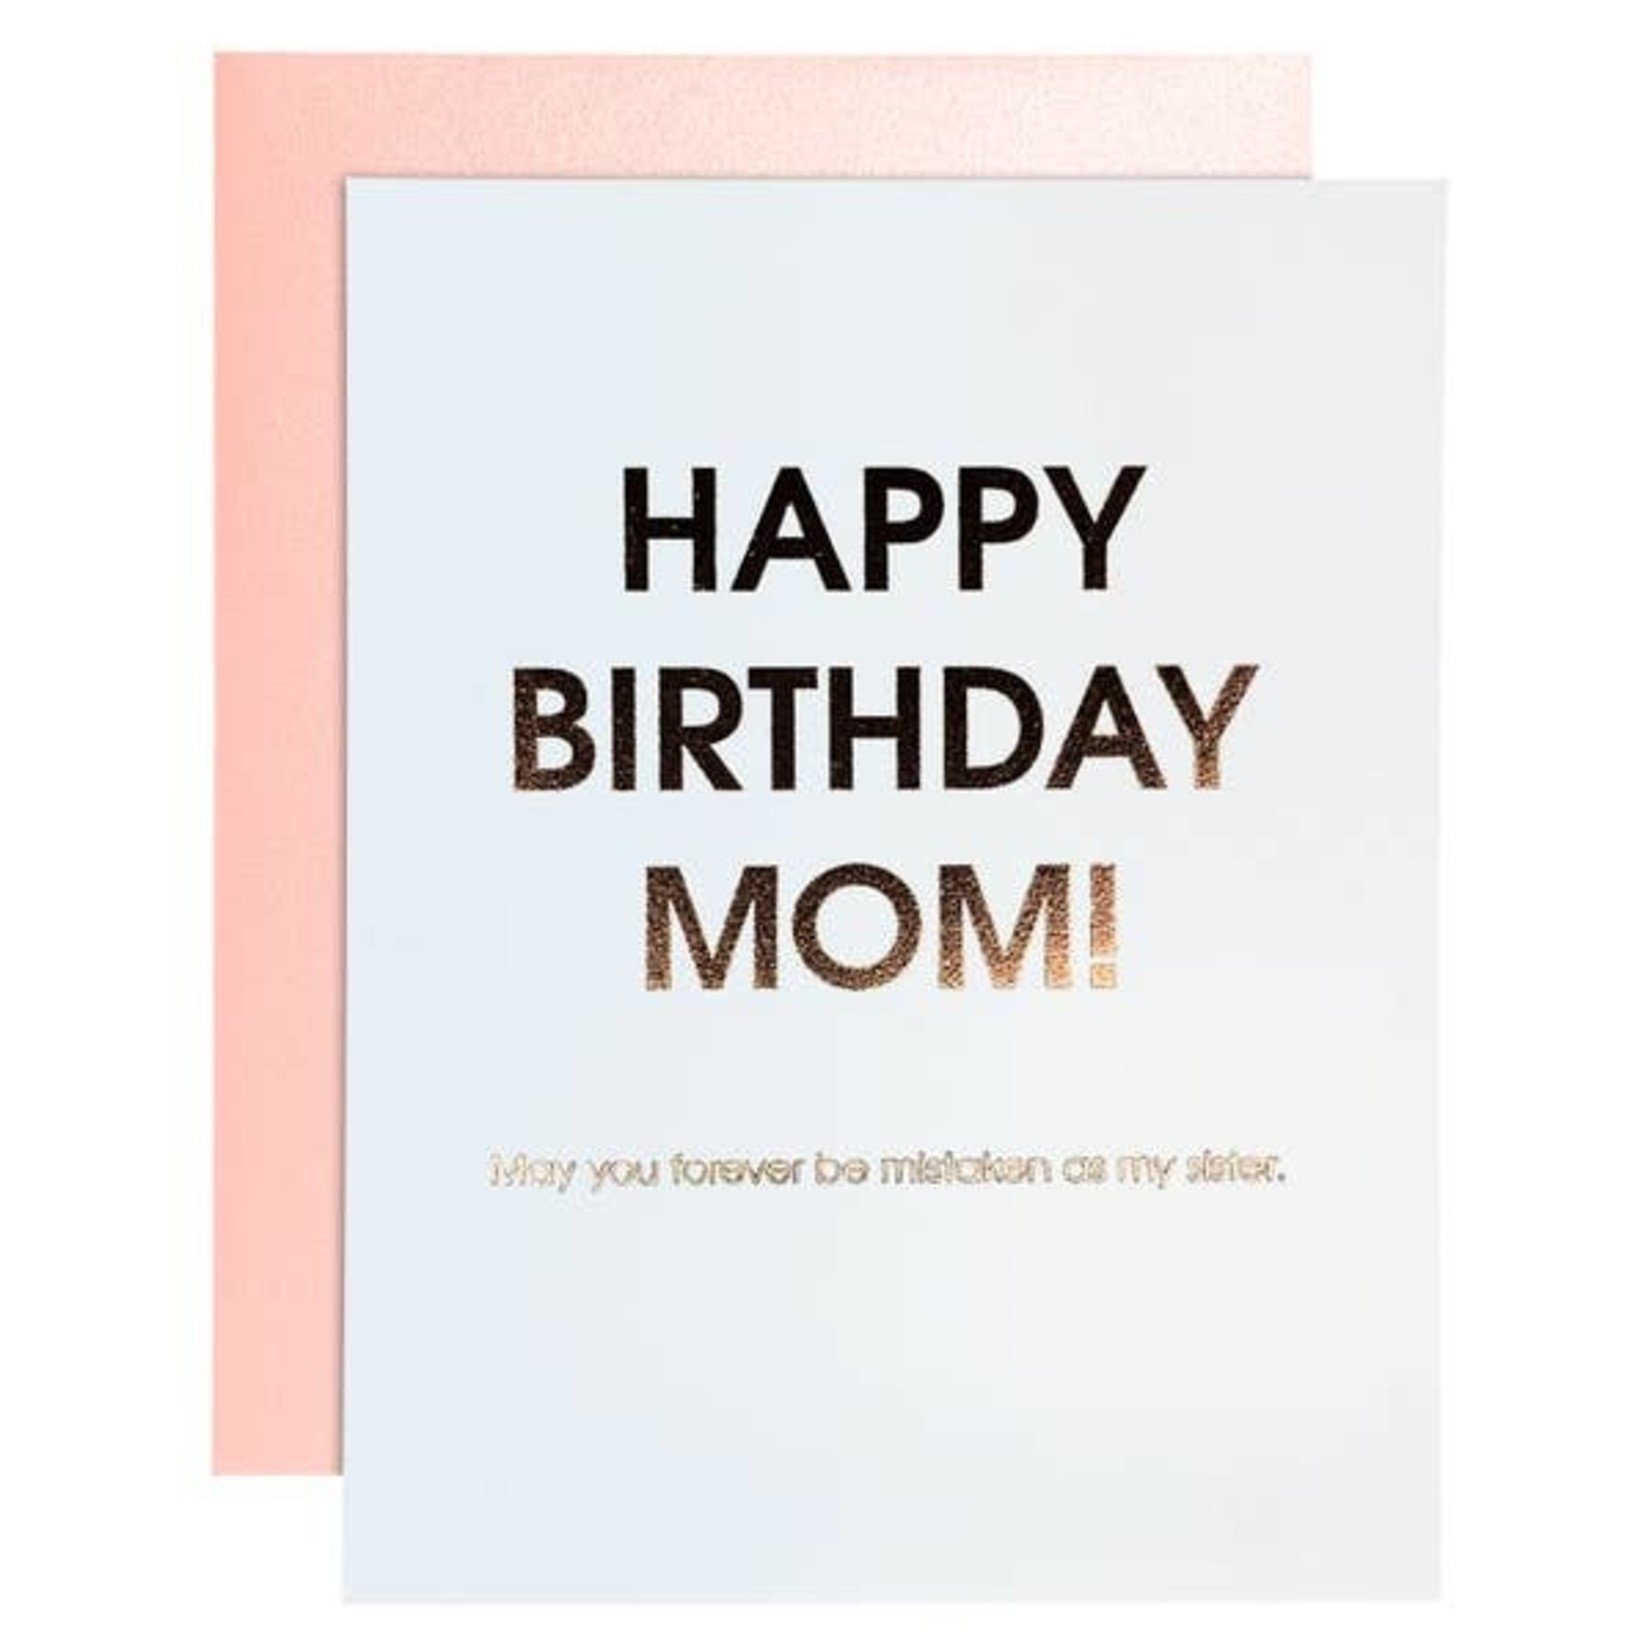 Chez Gagne Chez Gagne Birthday Mom - Mistaken Sister Rose Gold